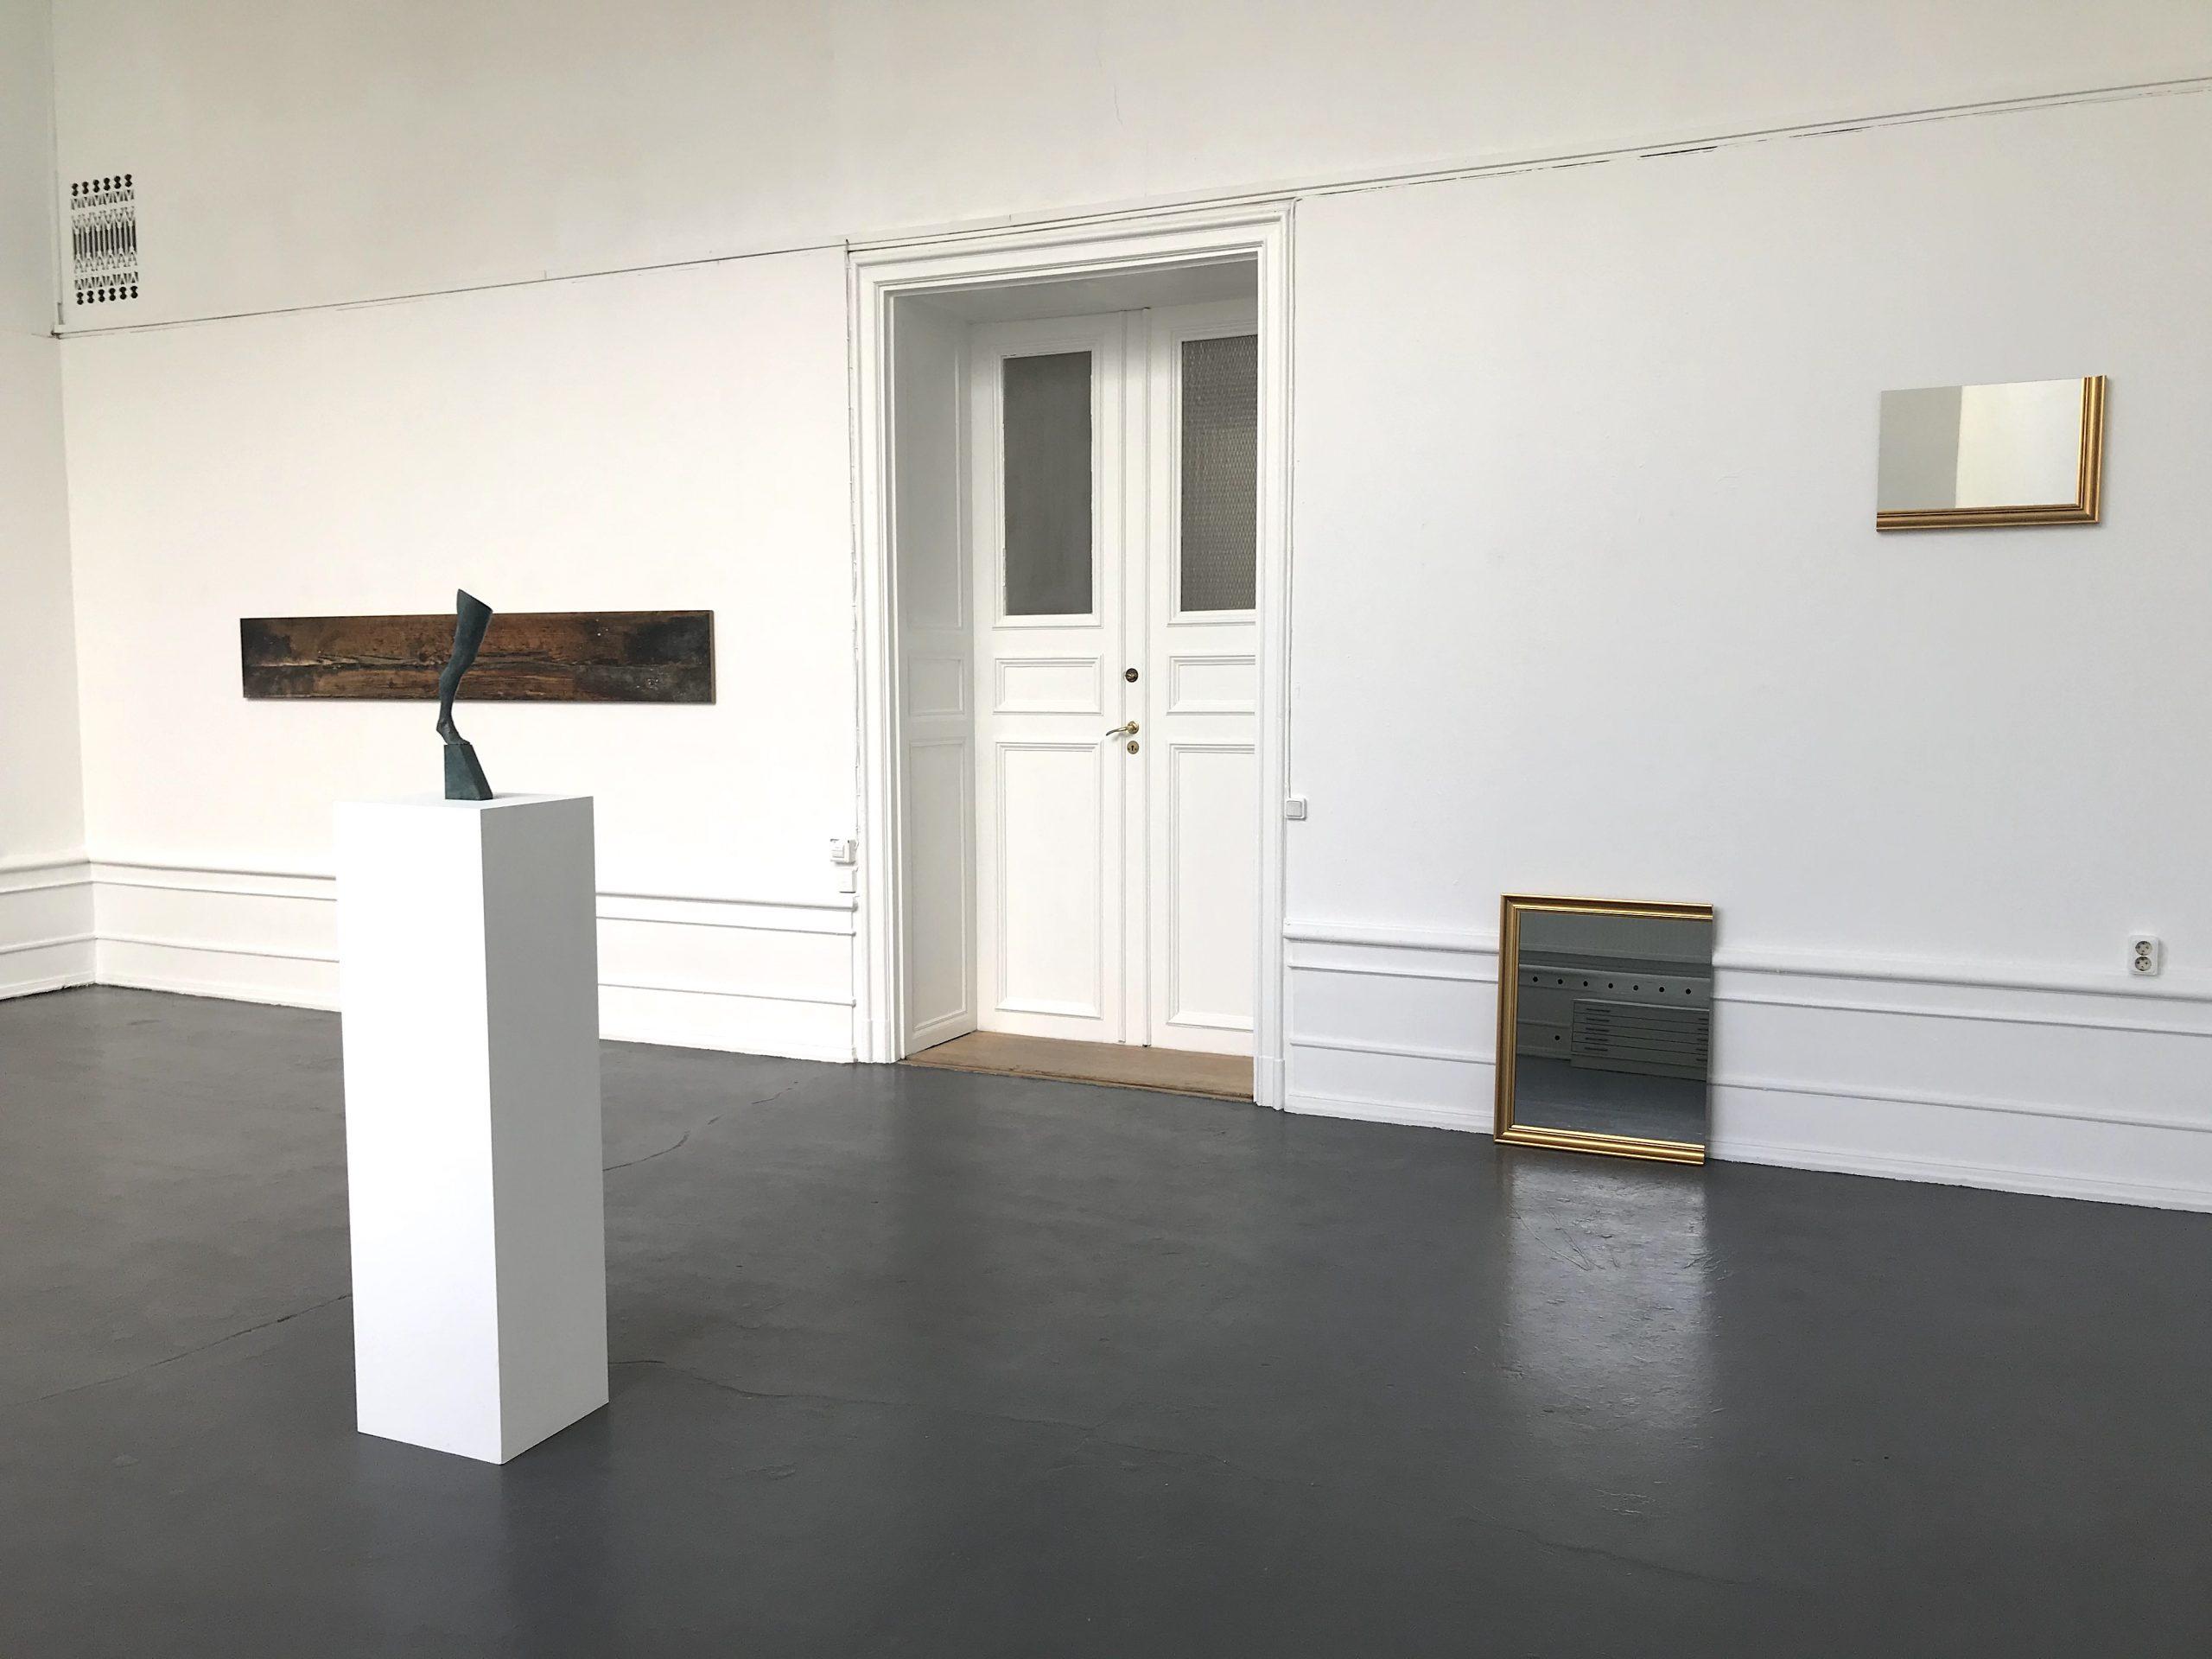 Ande och Materia / Mind and Matter, april 2020. Kristoffer Nilson  (photography), Fredrik Wretman (sculpture), Karin Ohlin (Mirror objects)